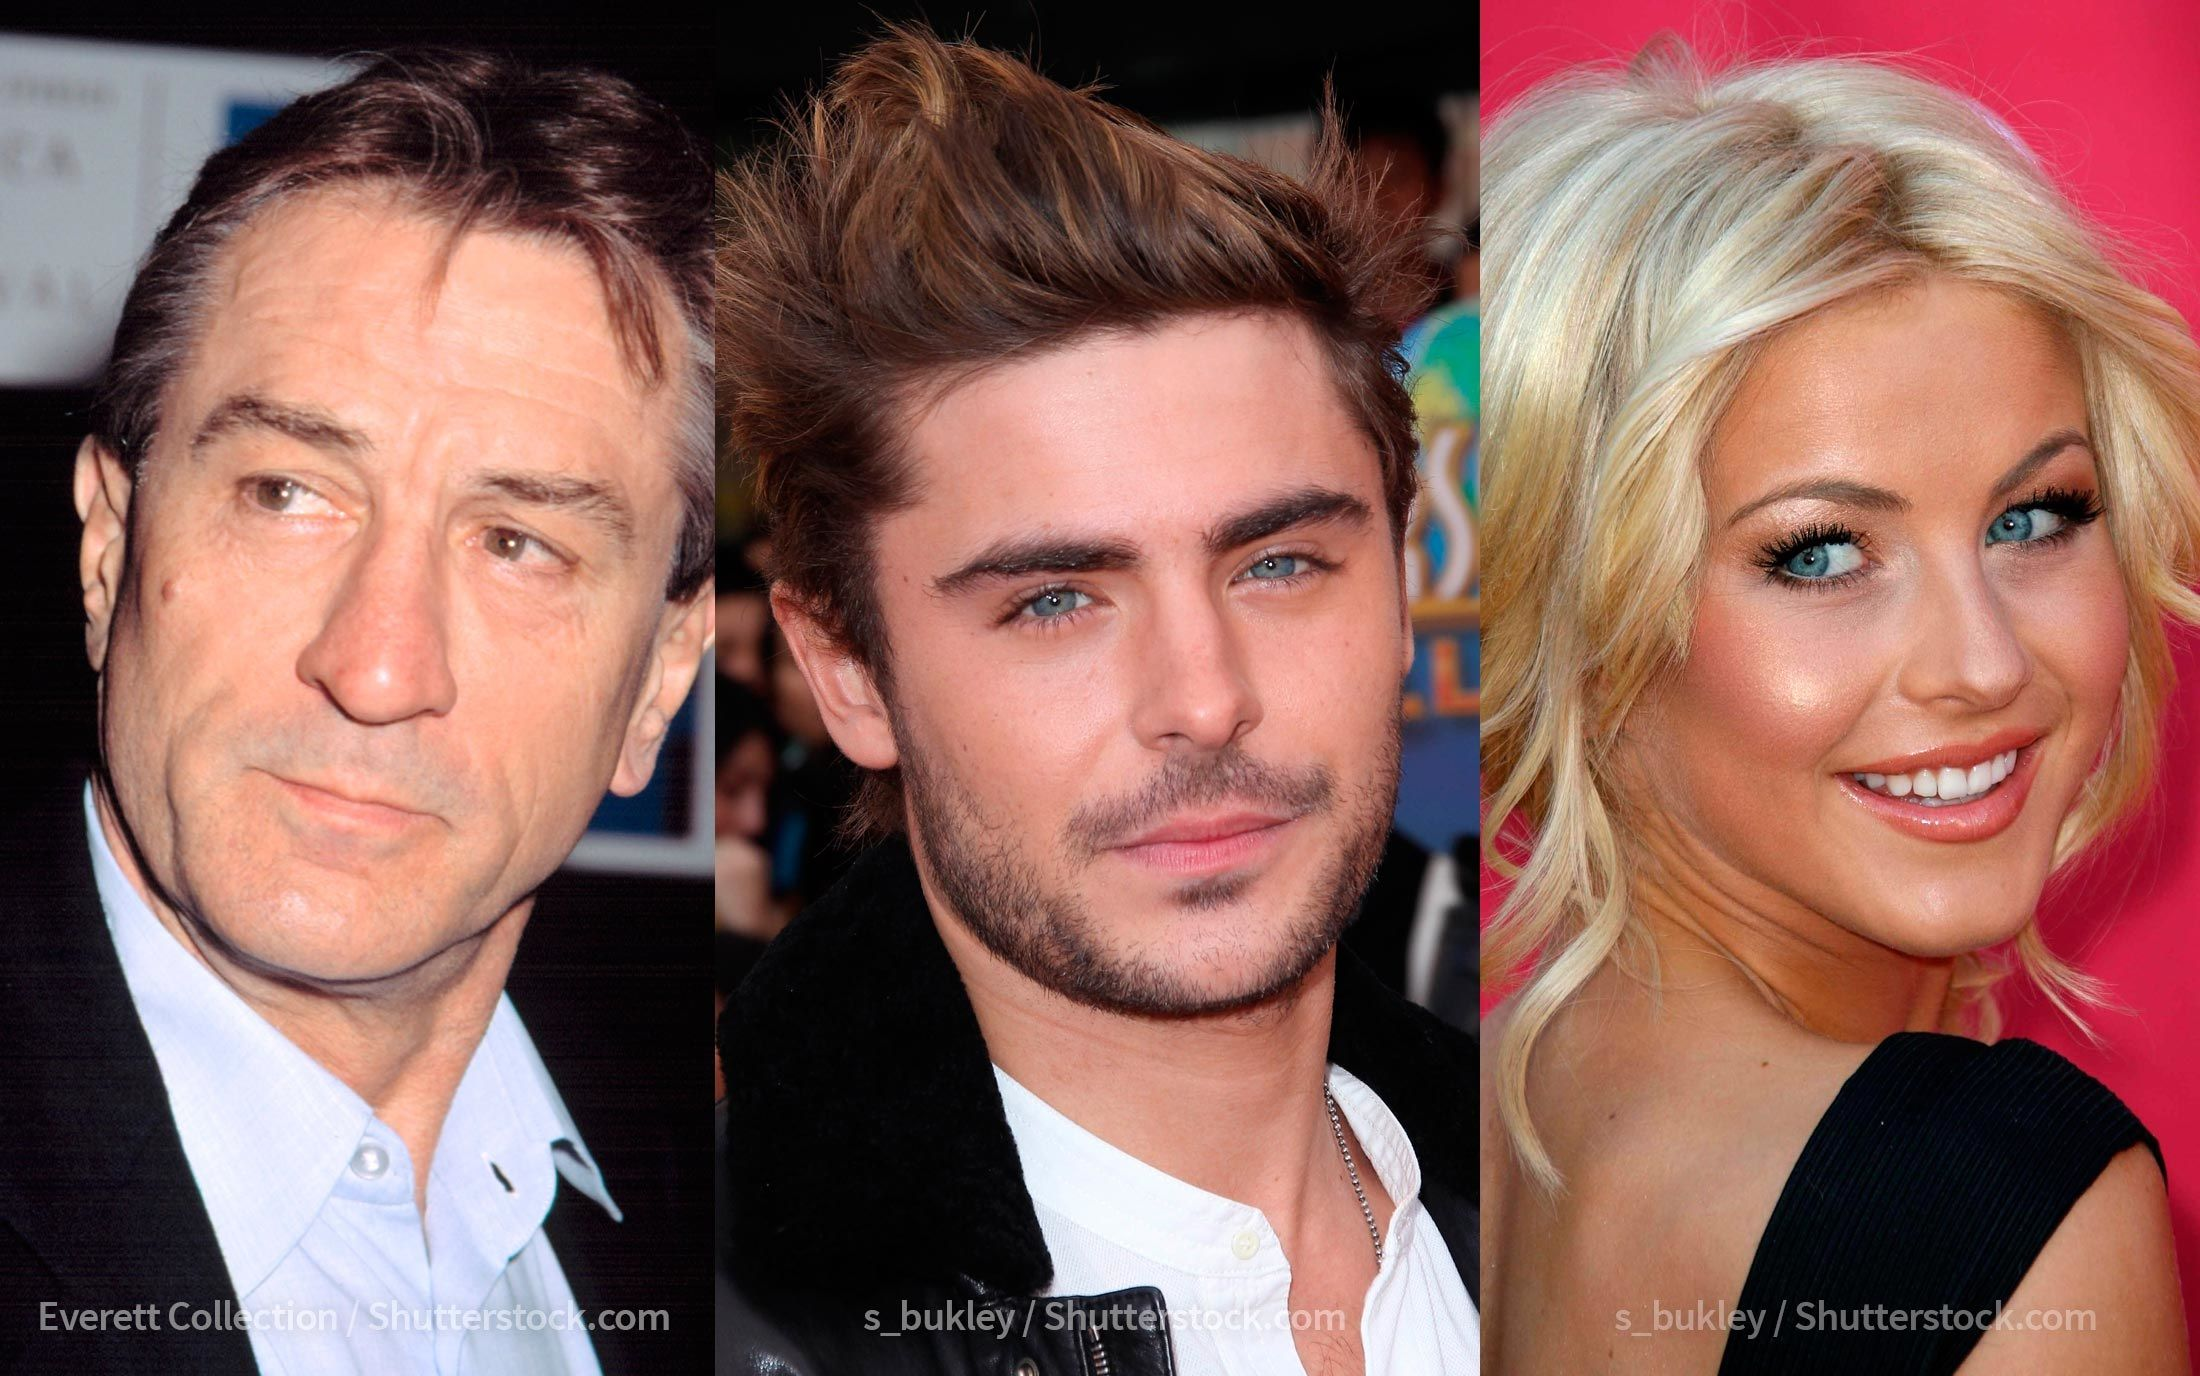 Dirty Grandpa Cast, Zac Efron net worth, Robert De Niro net worth, Julianne Hough net worth